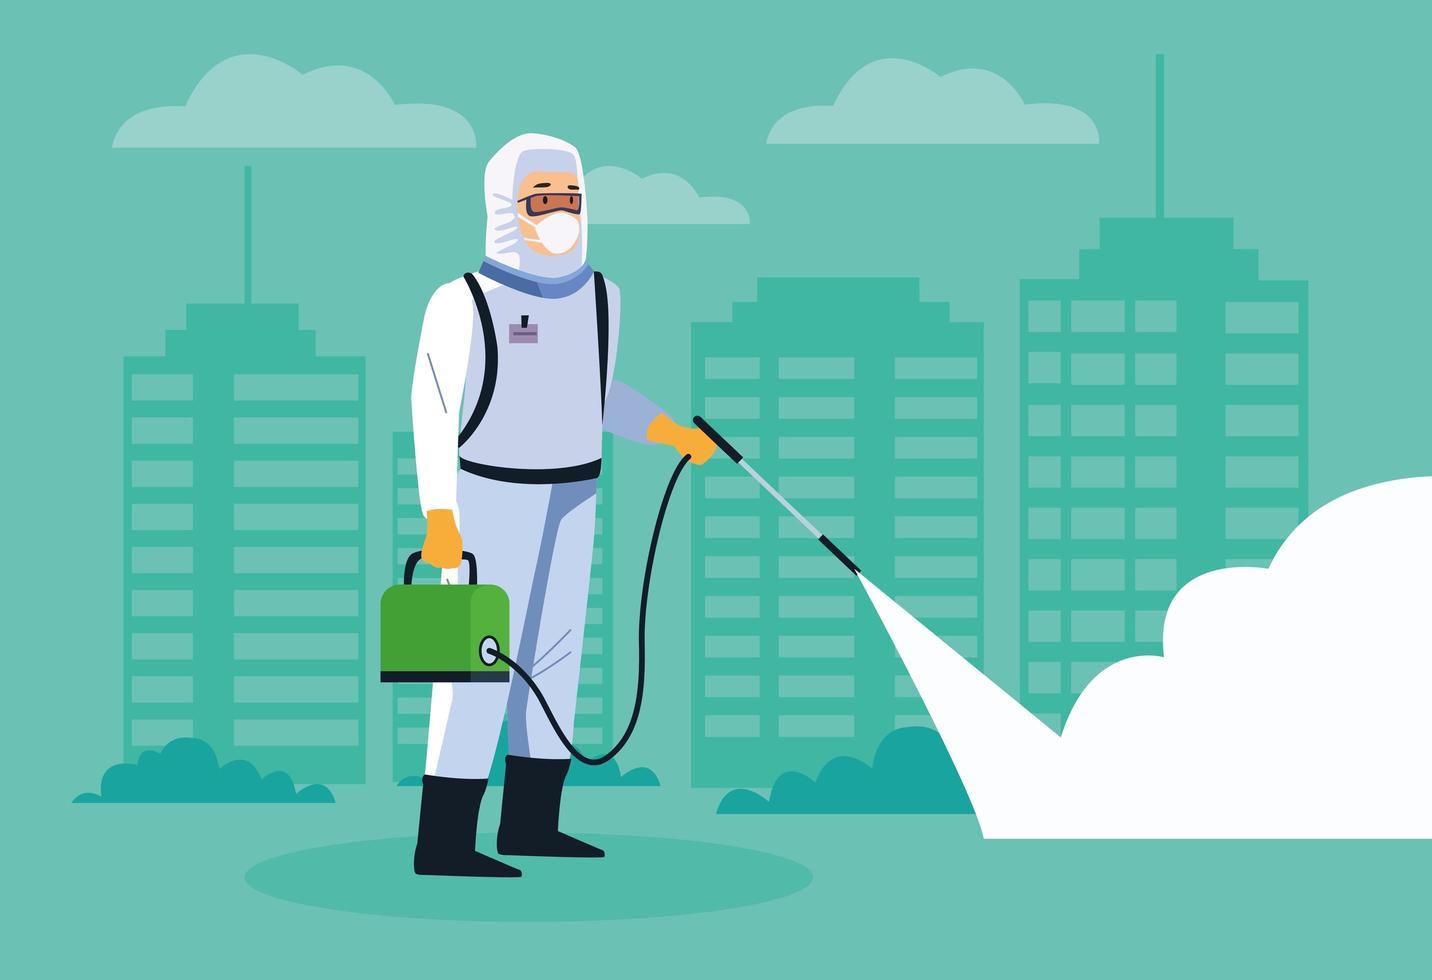 bioveiligheidsmedewerker desinfecteert straat vector